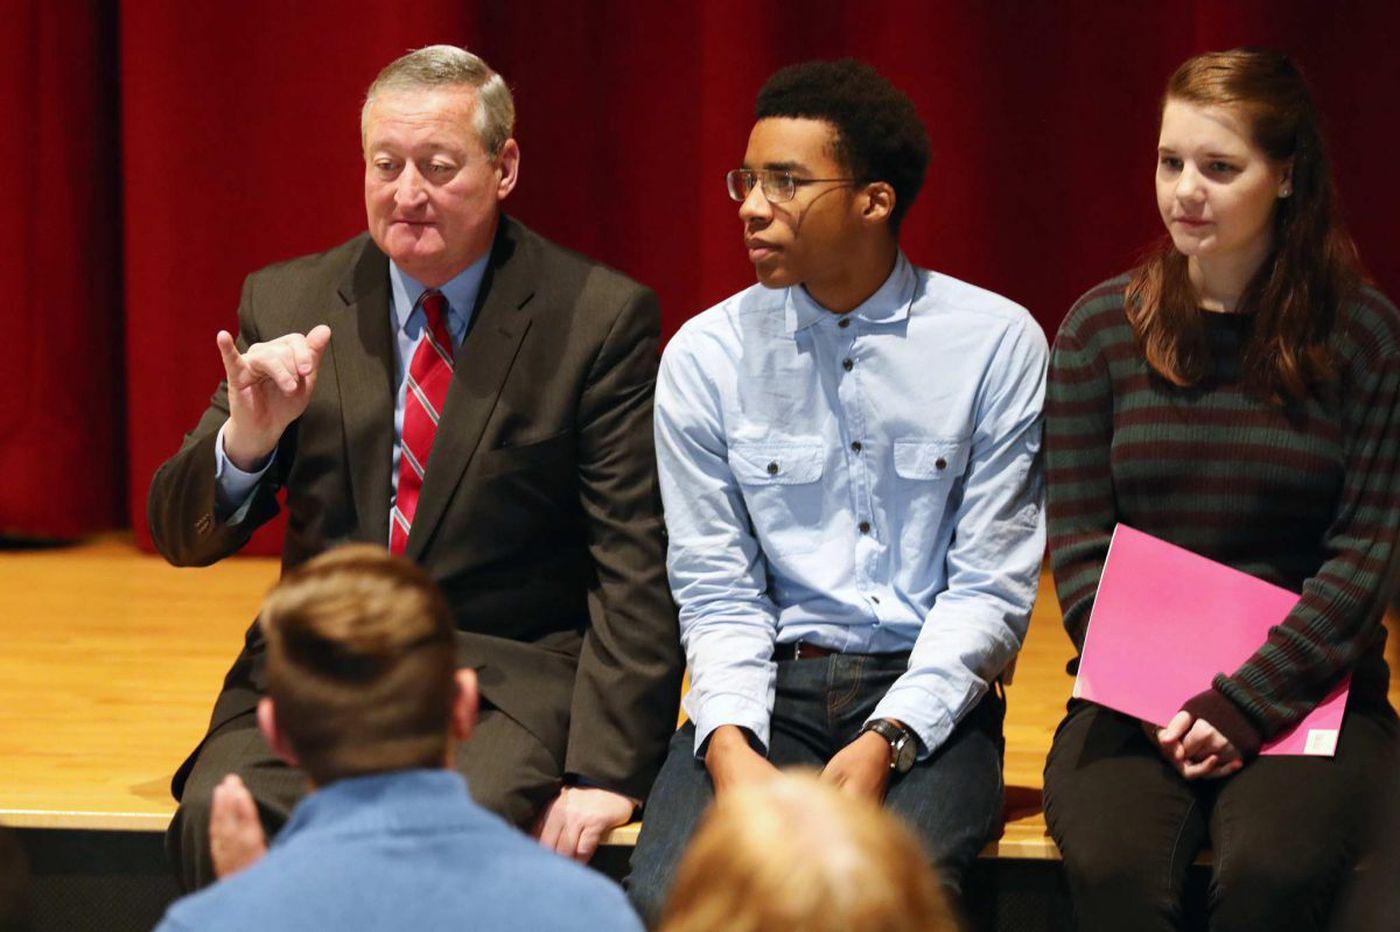 Philly school graduation rates up; mayor promises more progress